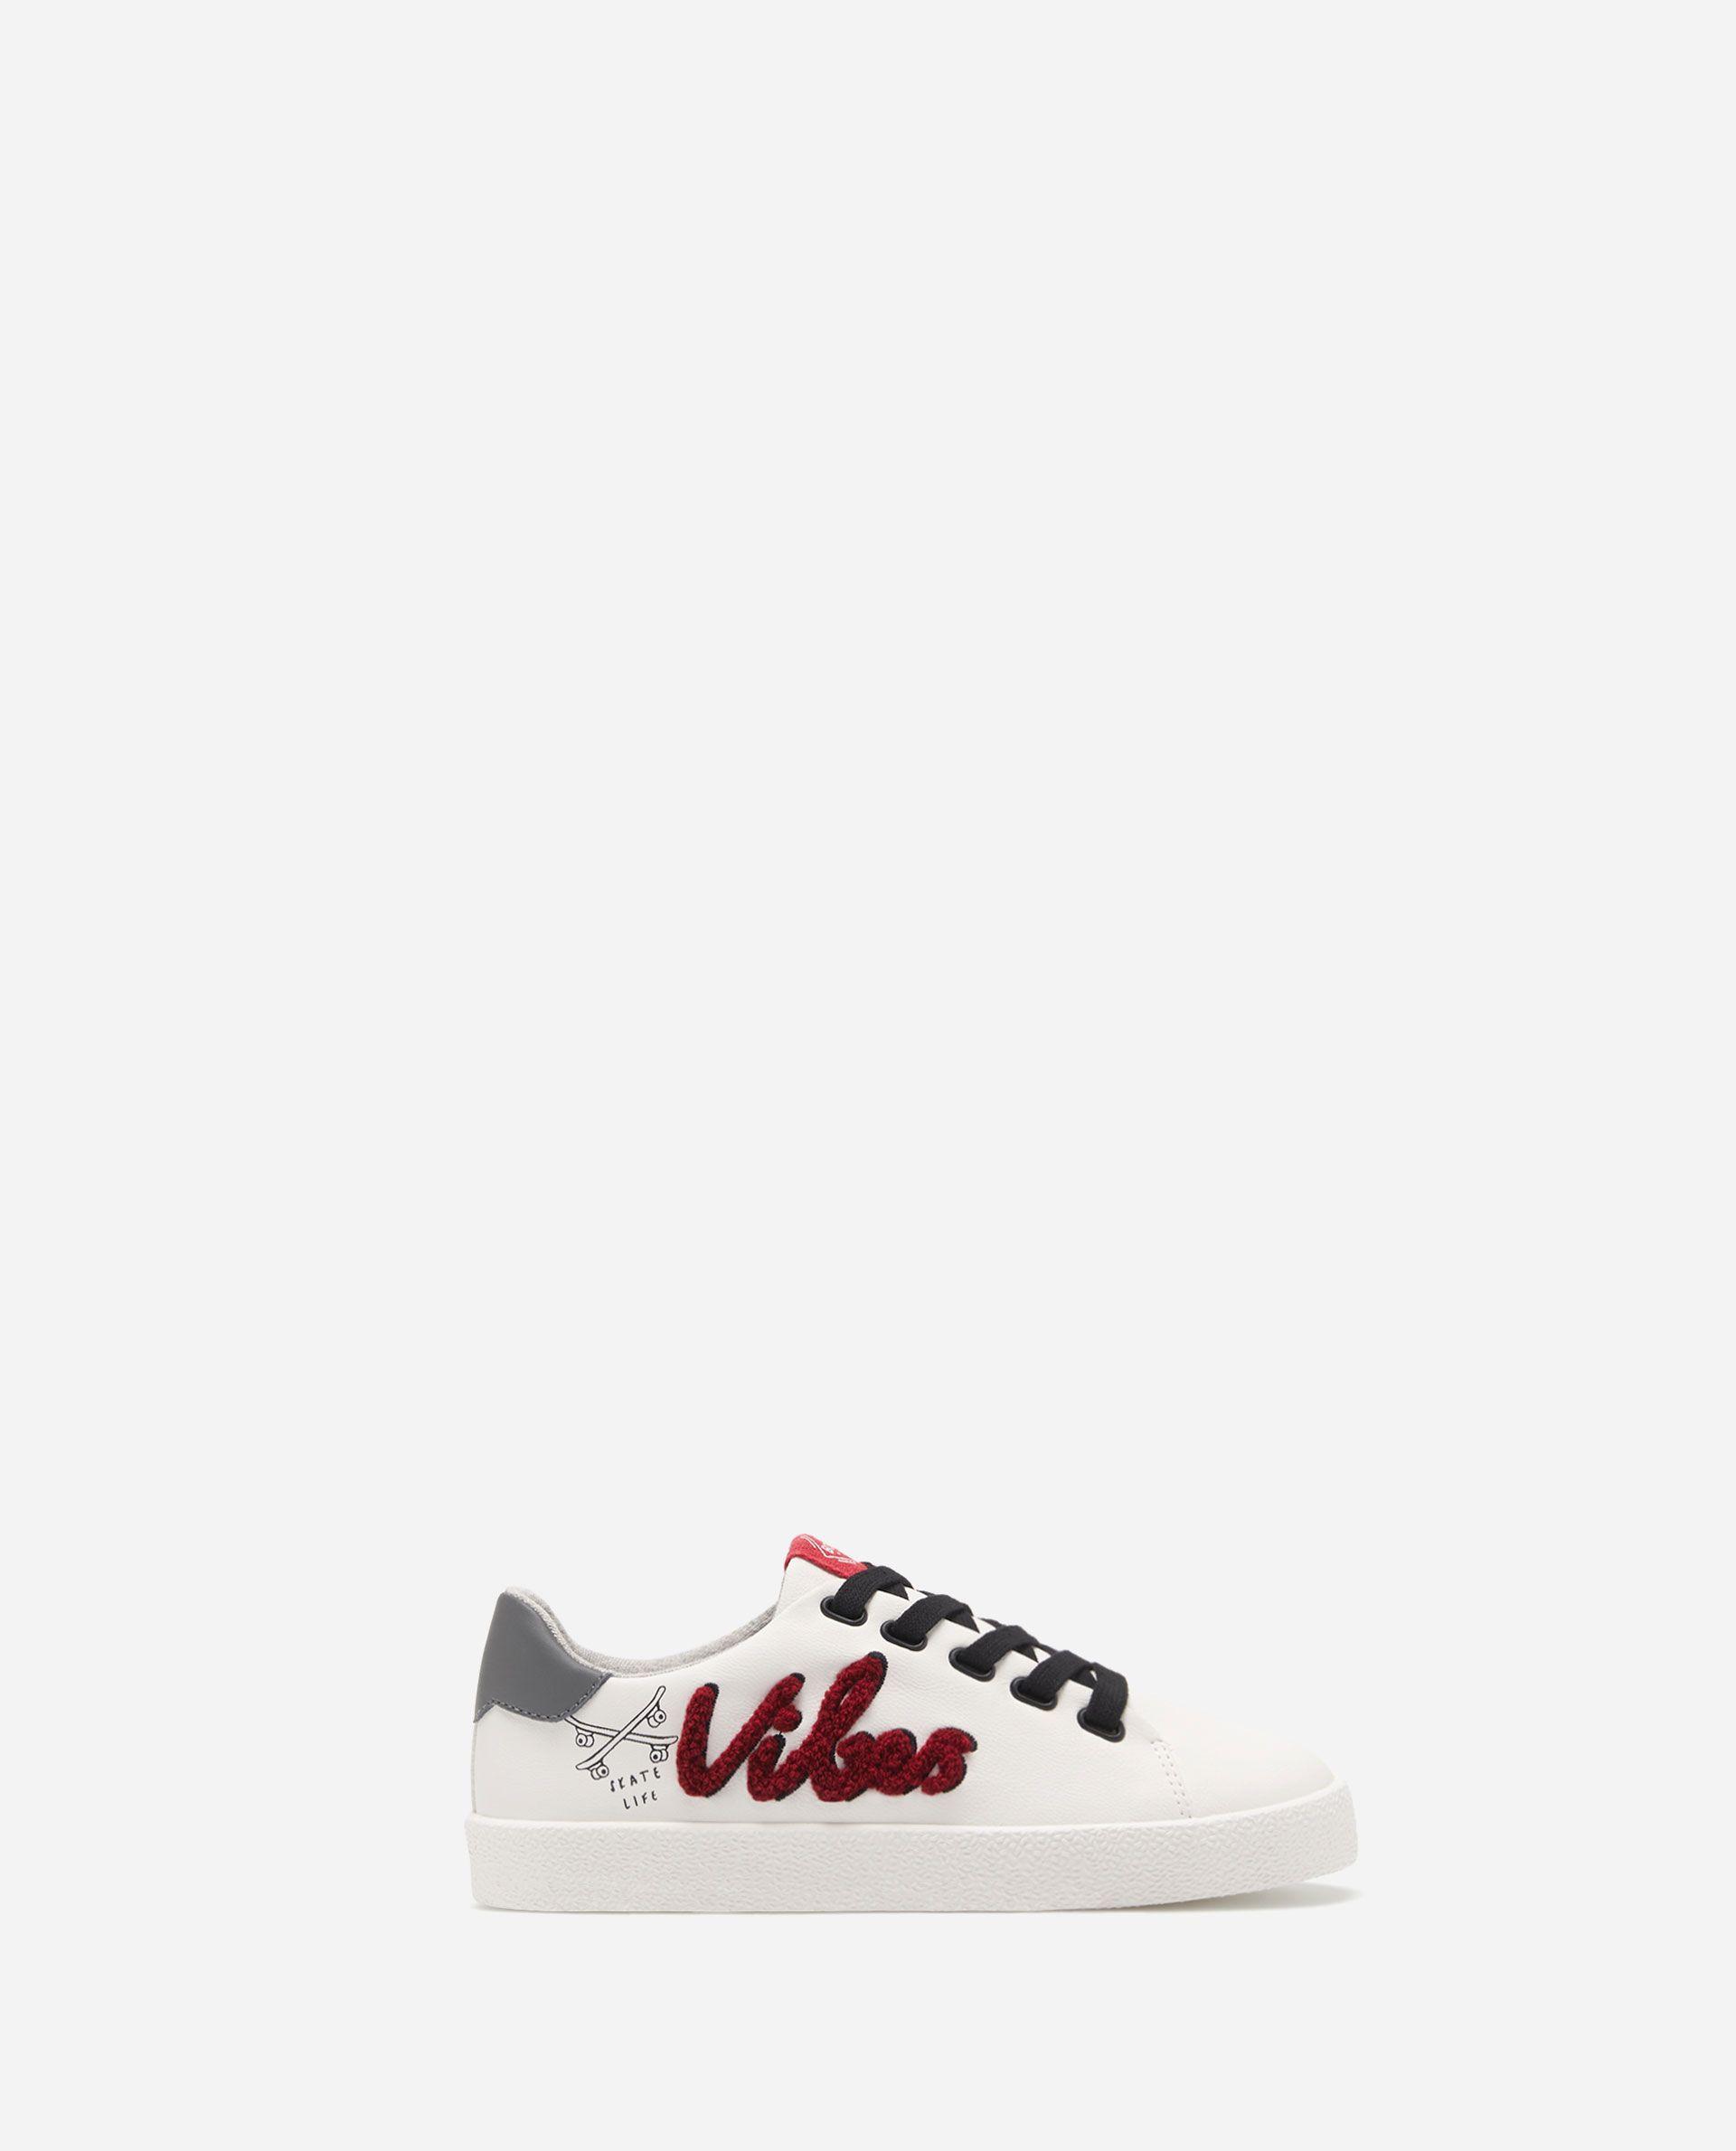 Vibes SneakersCasual Cute Bamba Felpa2019 Y Shoes 0mwvn8NO